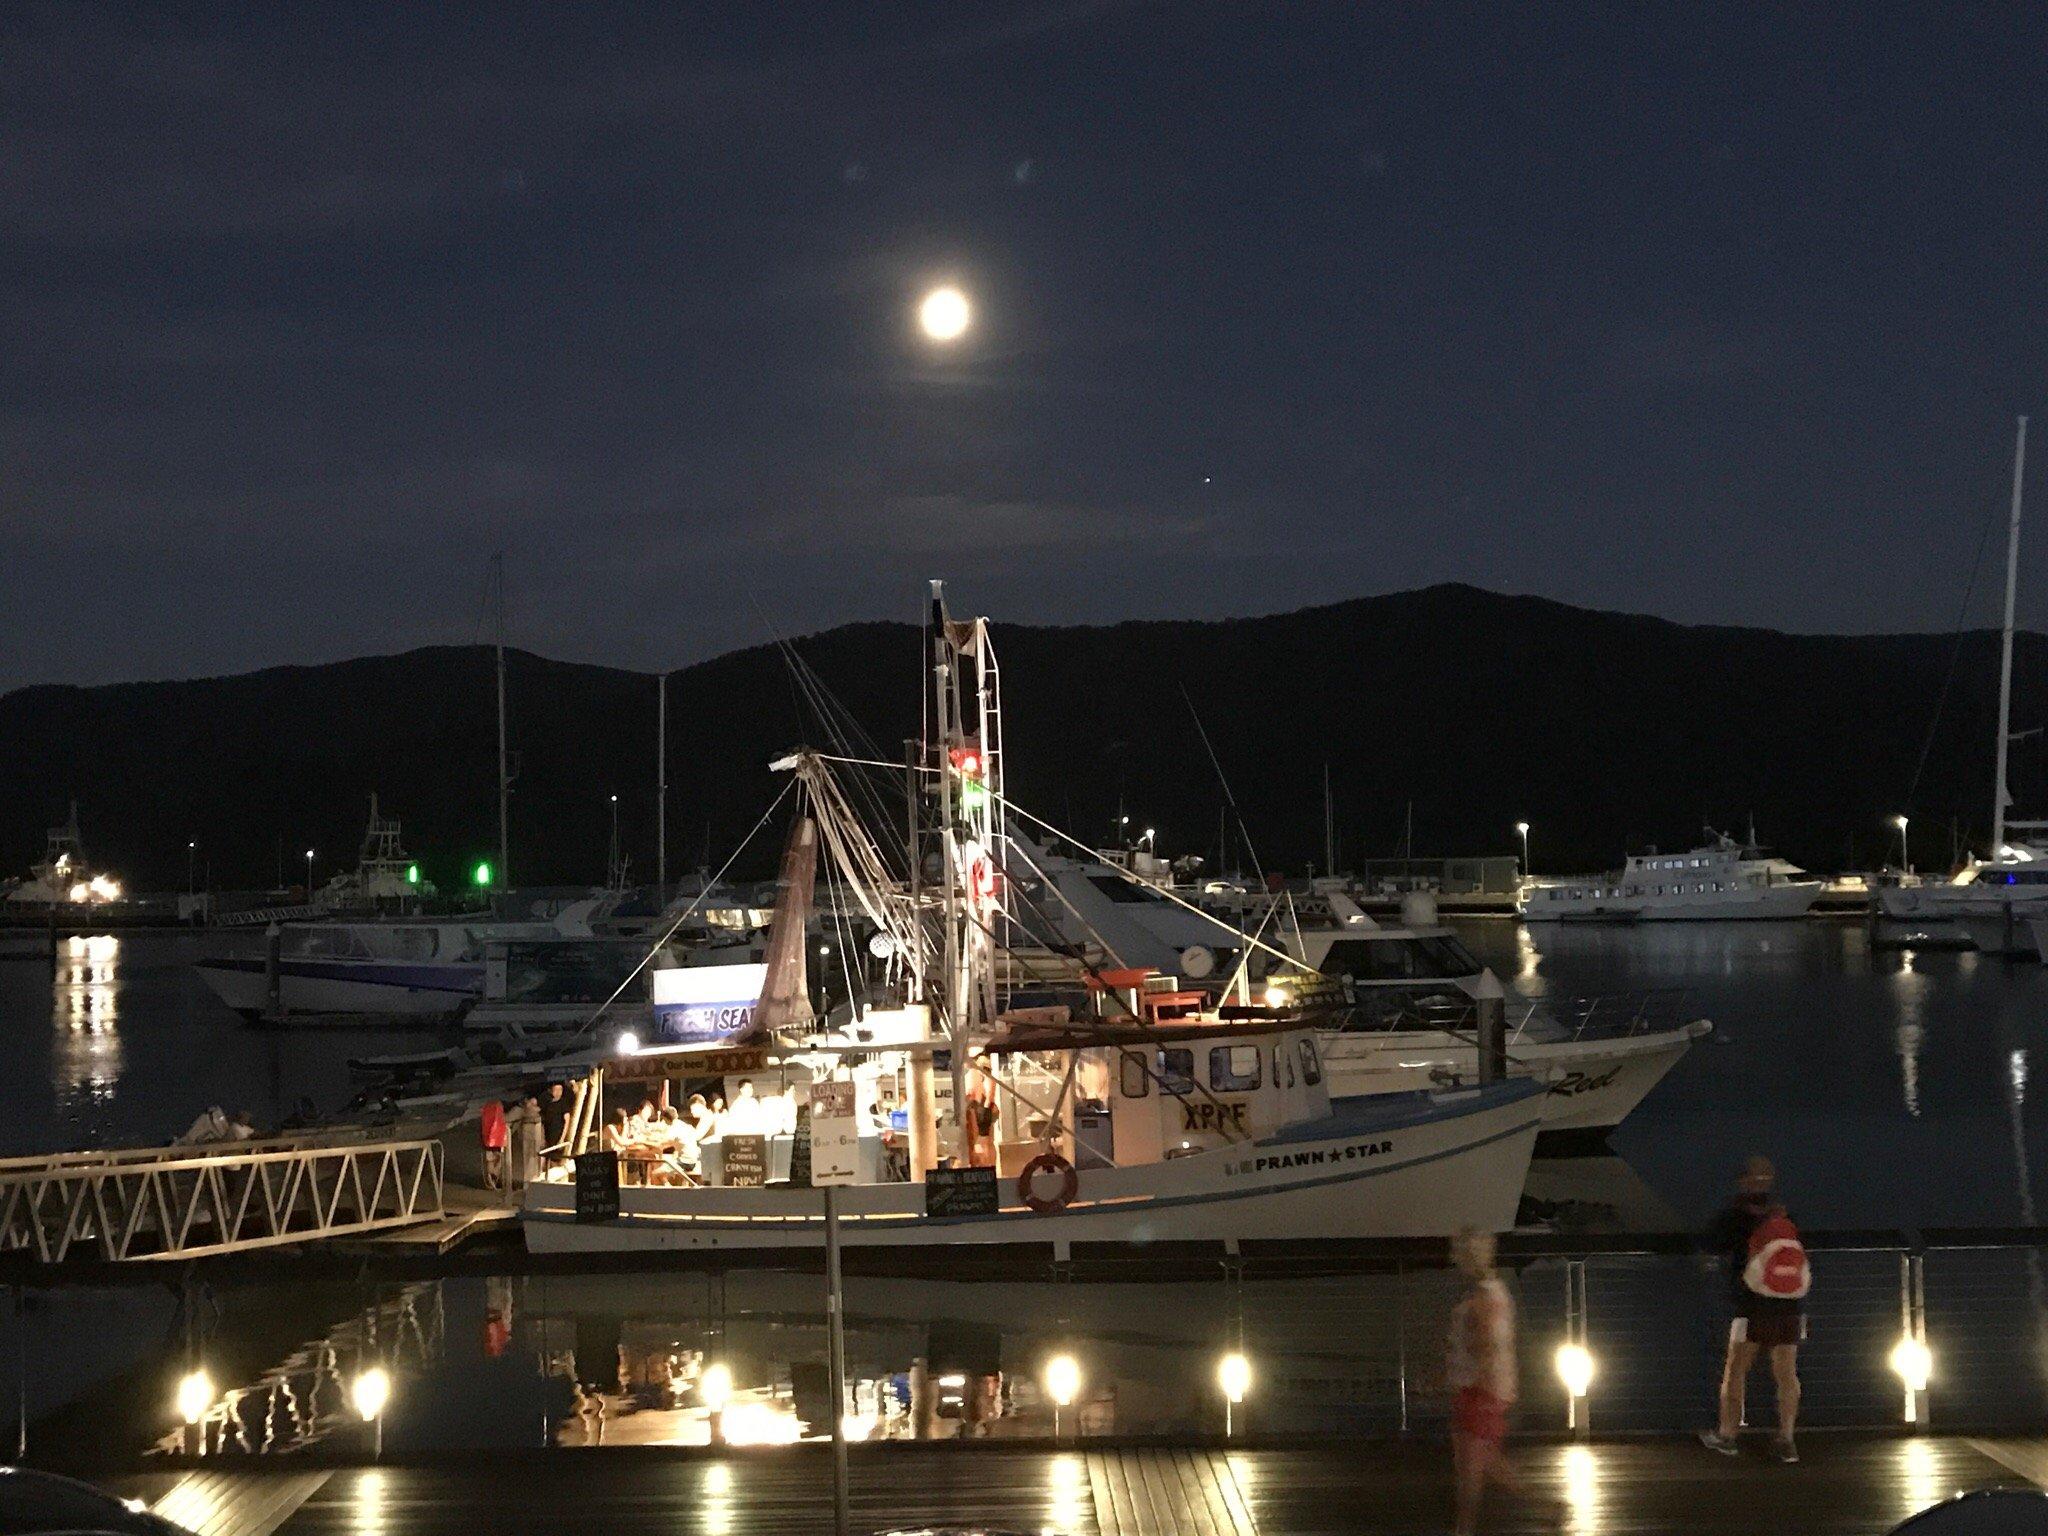 Prawn Star是一家停泊岸邊的船餐廳。